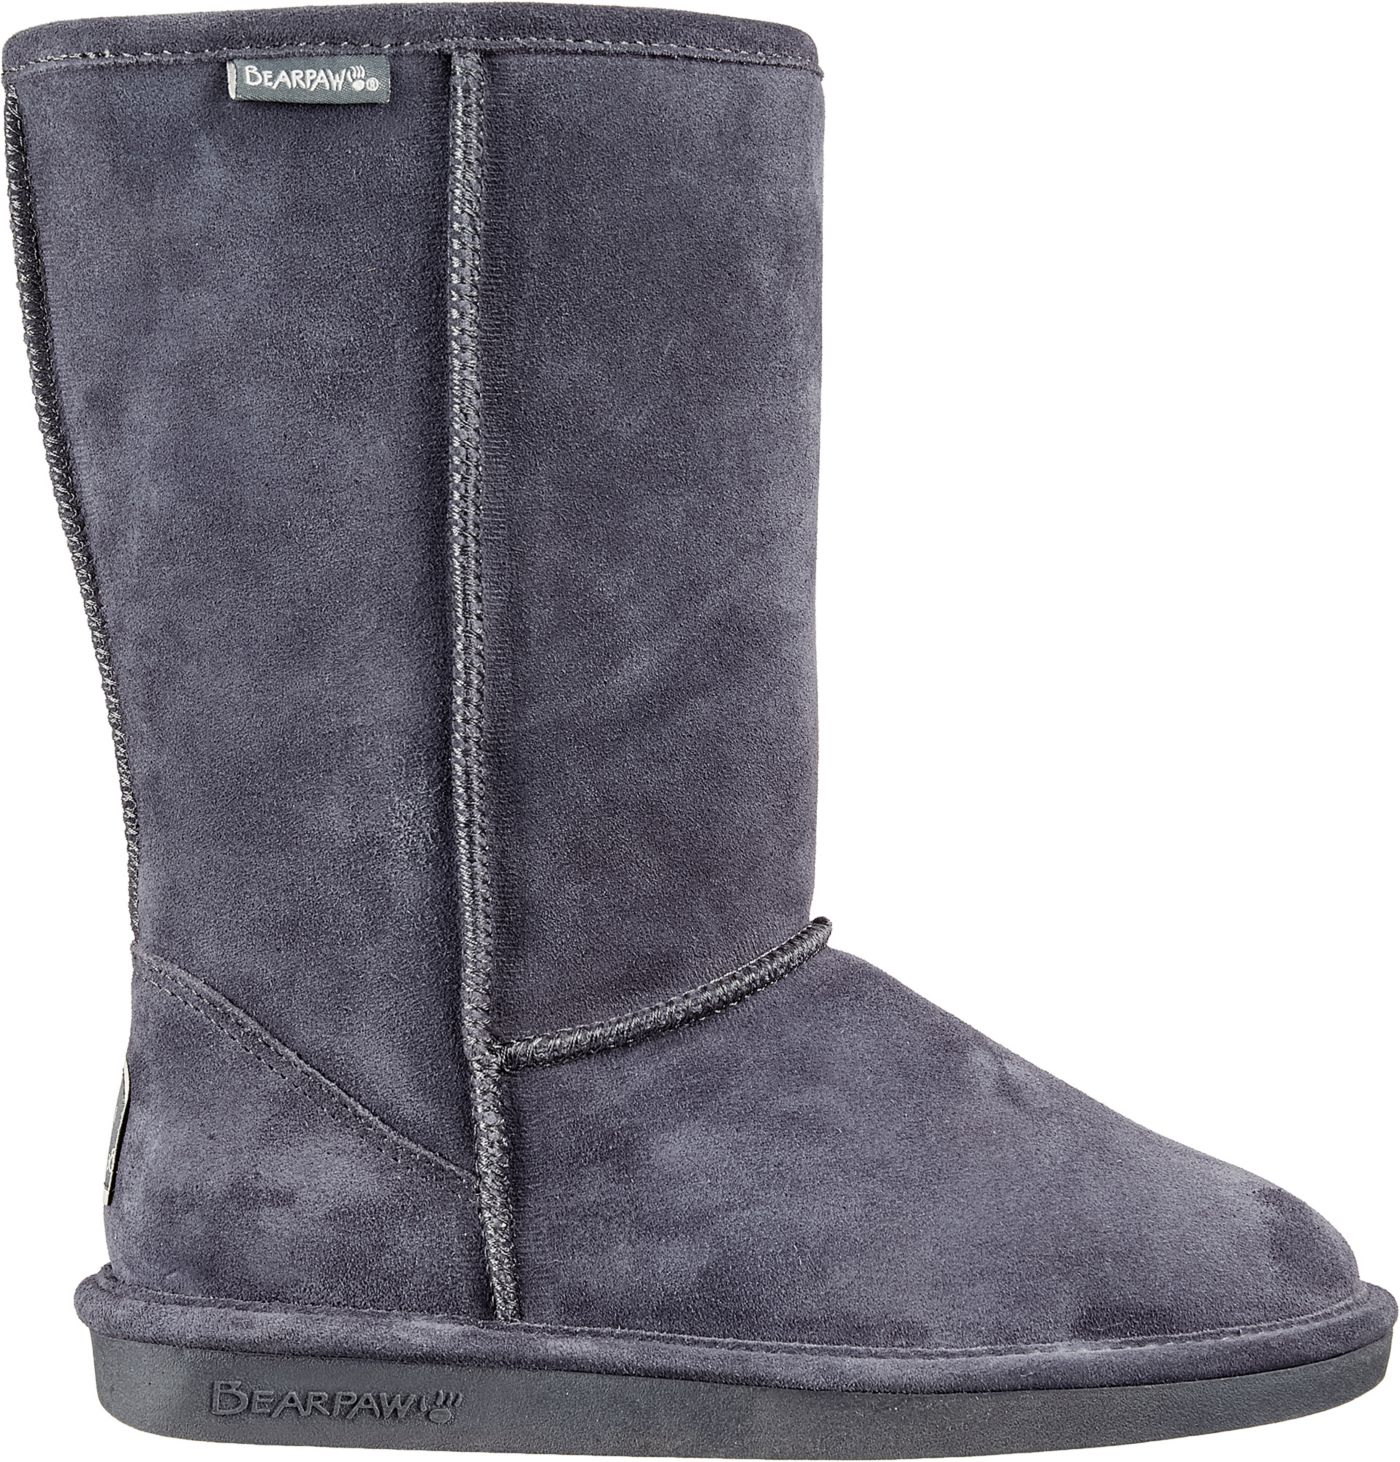 BEARPAW Women's Eva Winter Boots